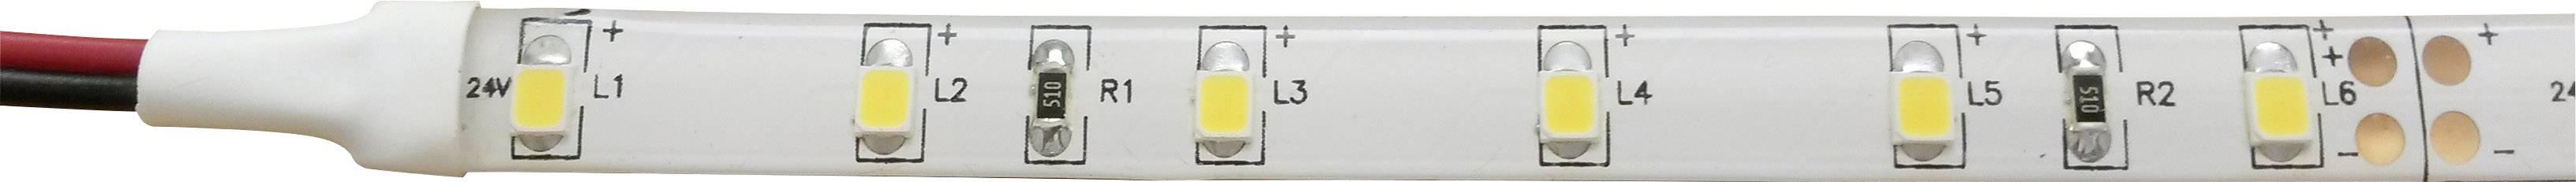 LED pásek Barthelme 51512434 51512434, 24 V, 6 wpm, bílá, 500 cm